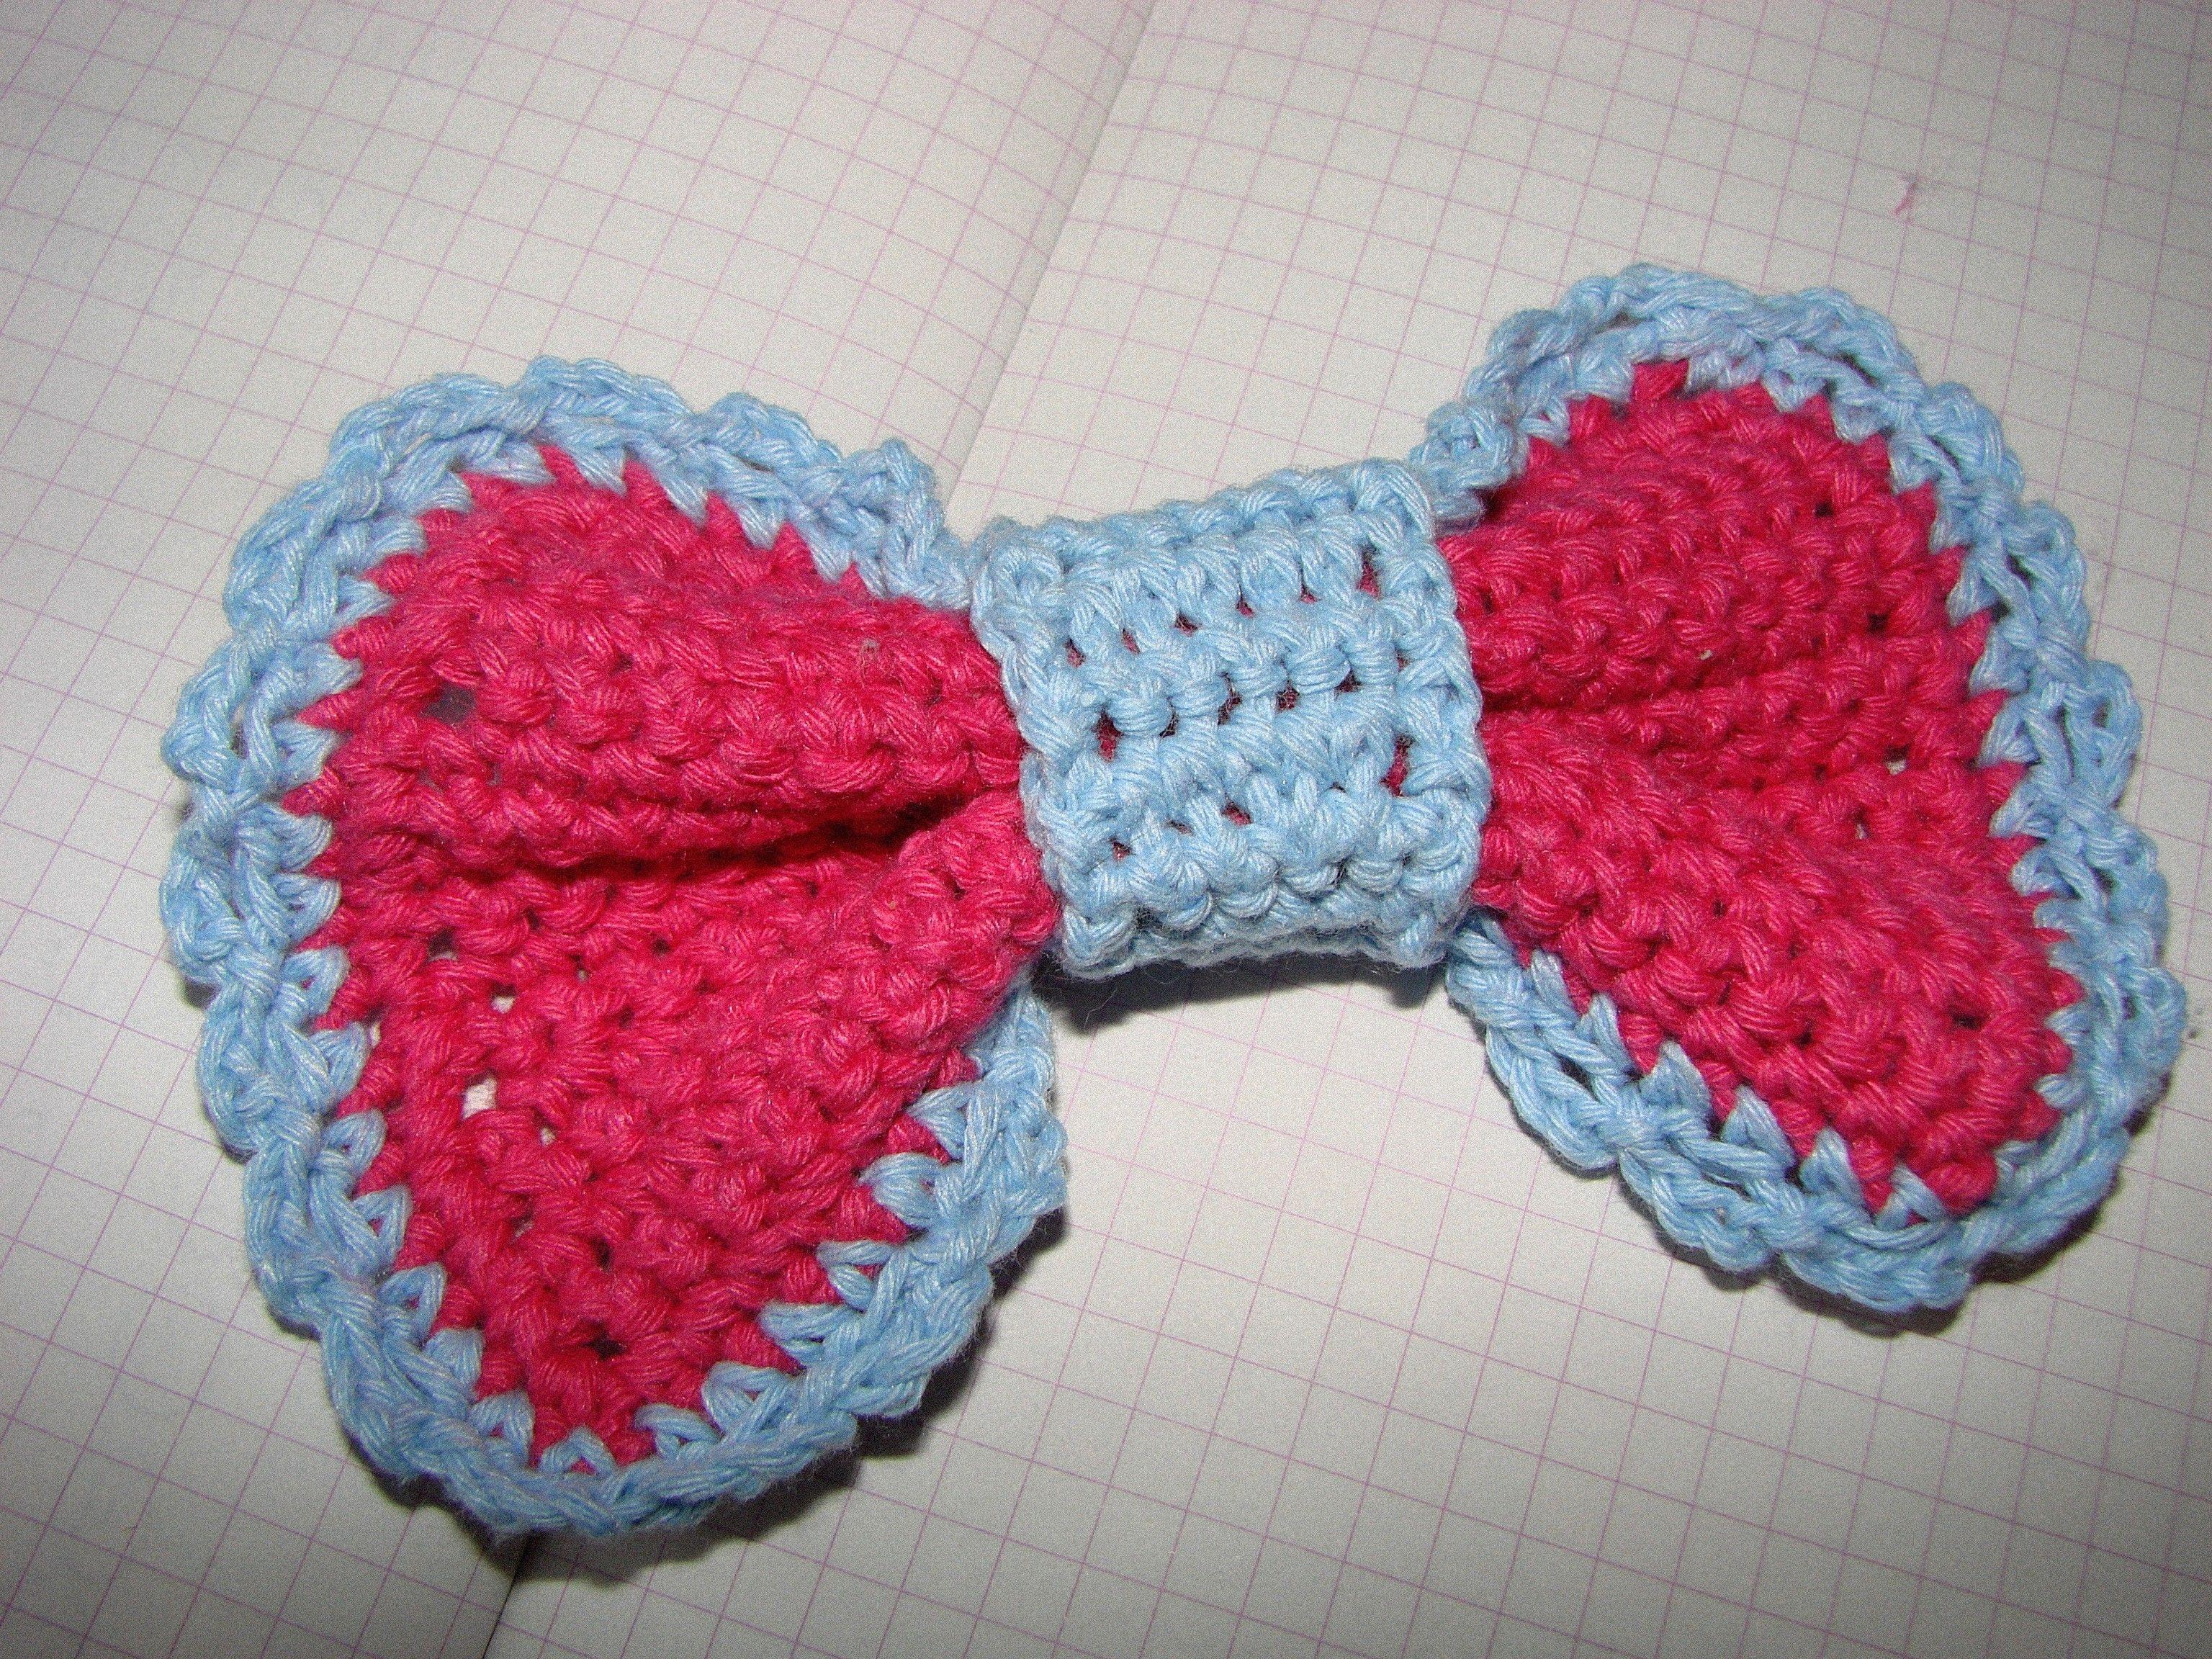 Crochet Bow : Crochet bow. Crochet bow Pinterest